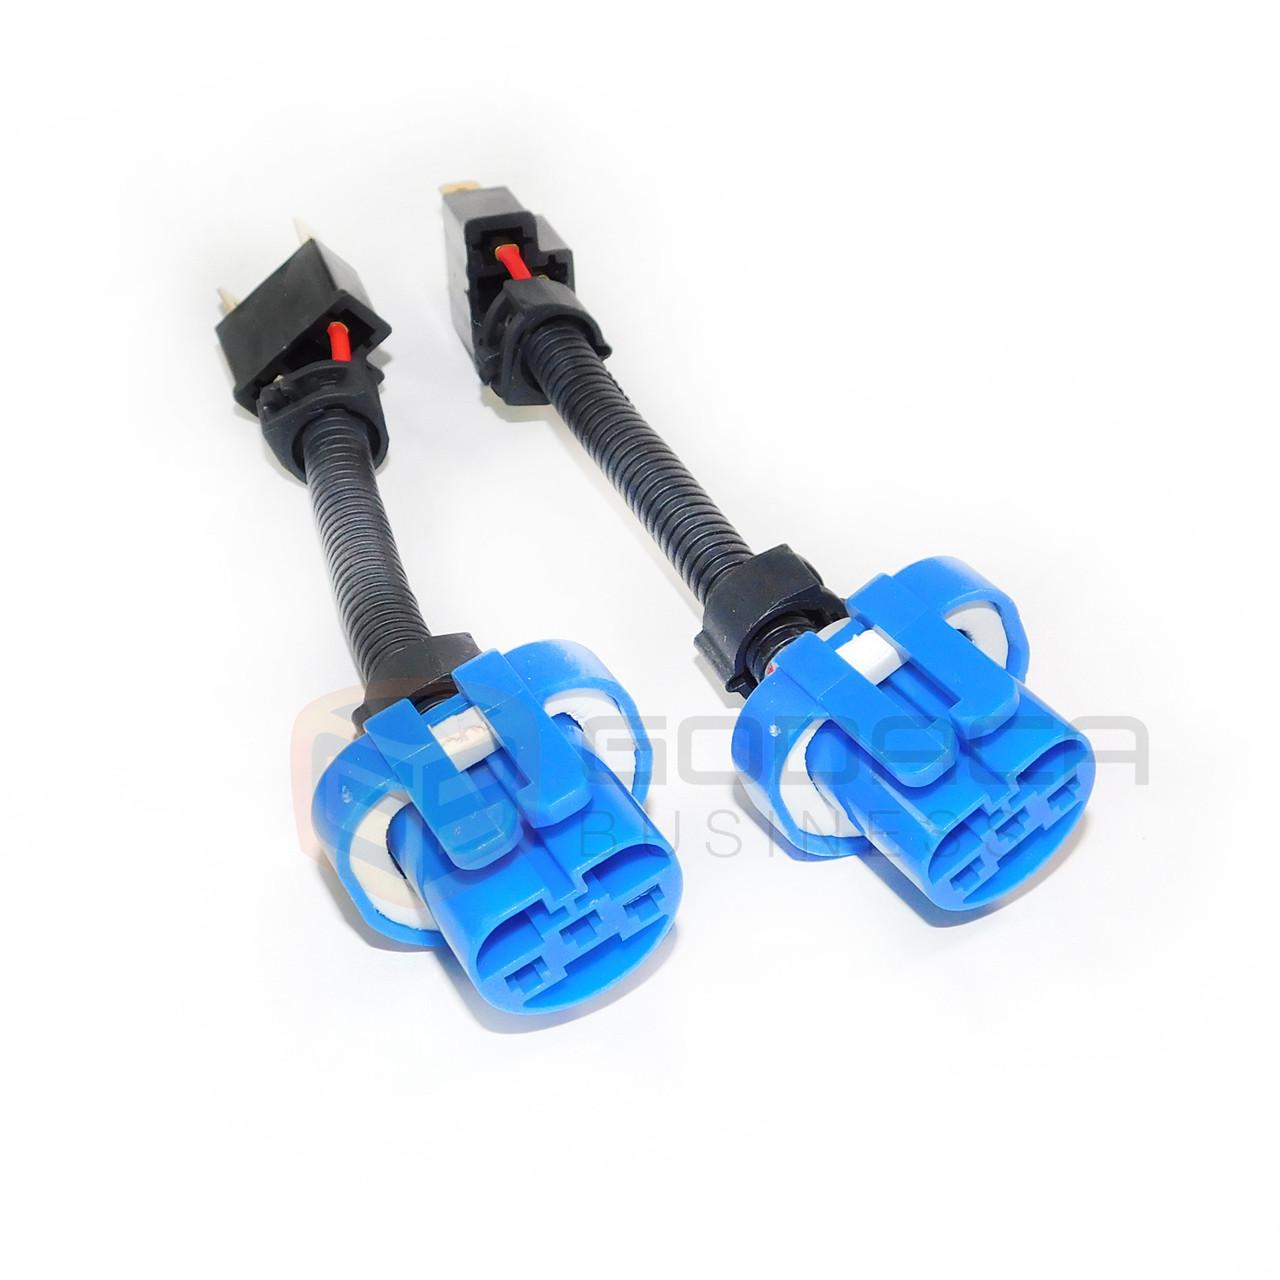 2x h4 9003 to 9007 hb5 headlight wiring conversion adapter plug play godaca llc  [ 1280 x 1280 Pixel ]